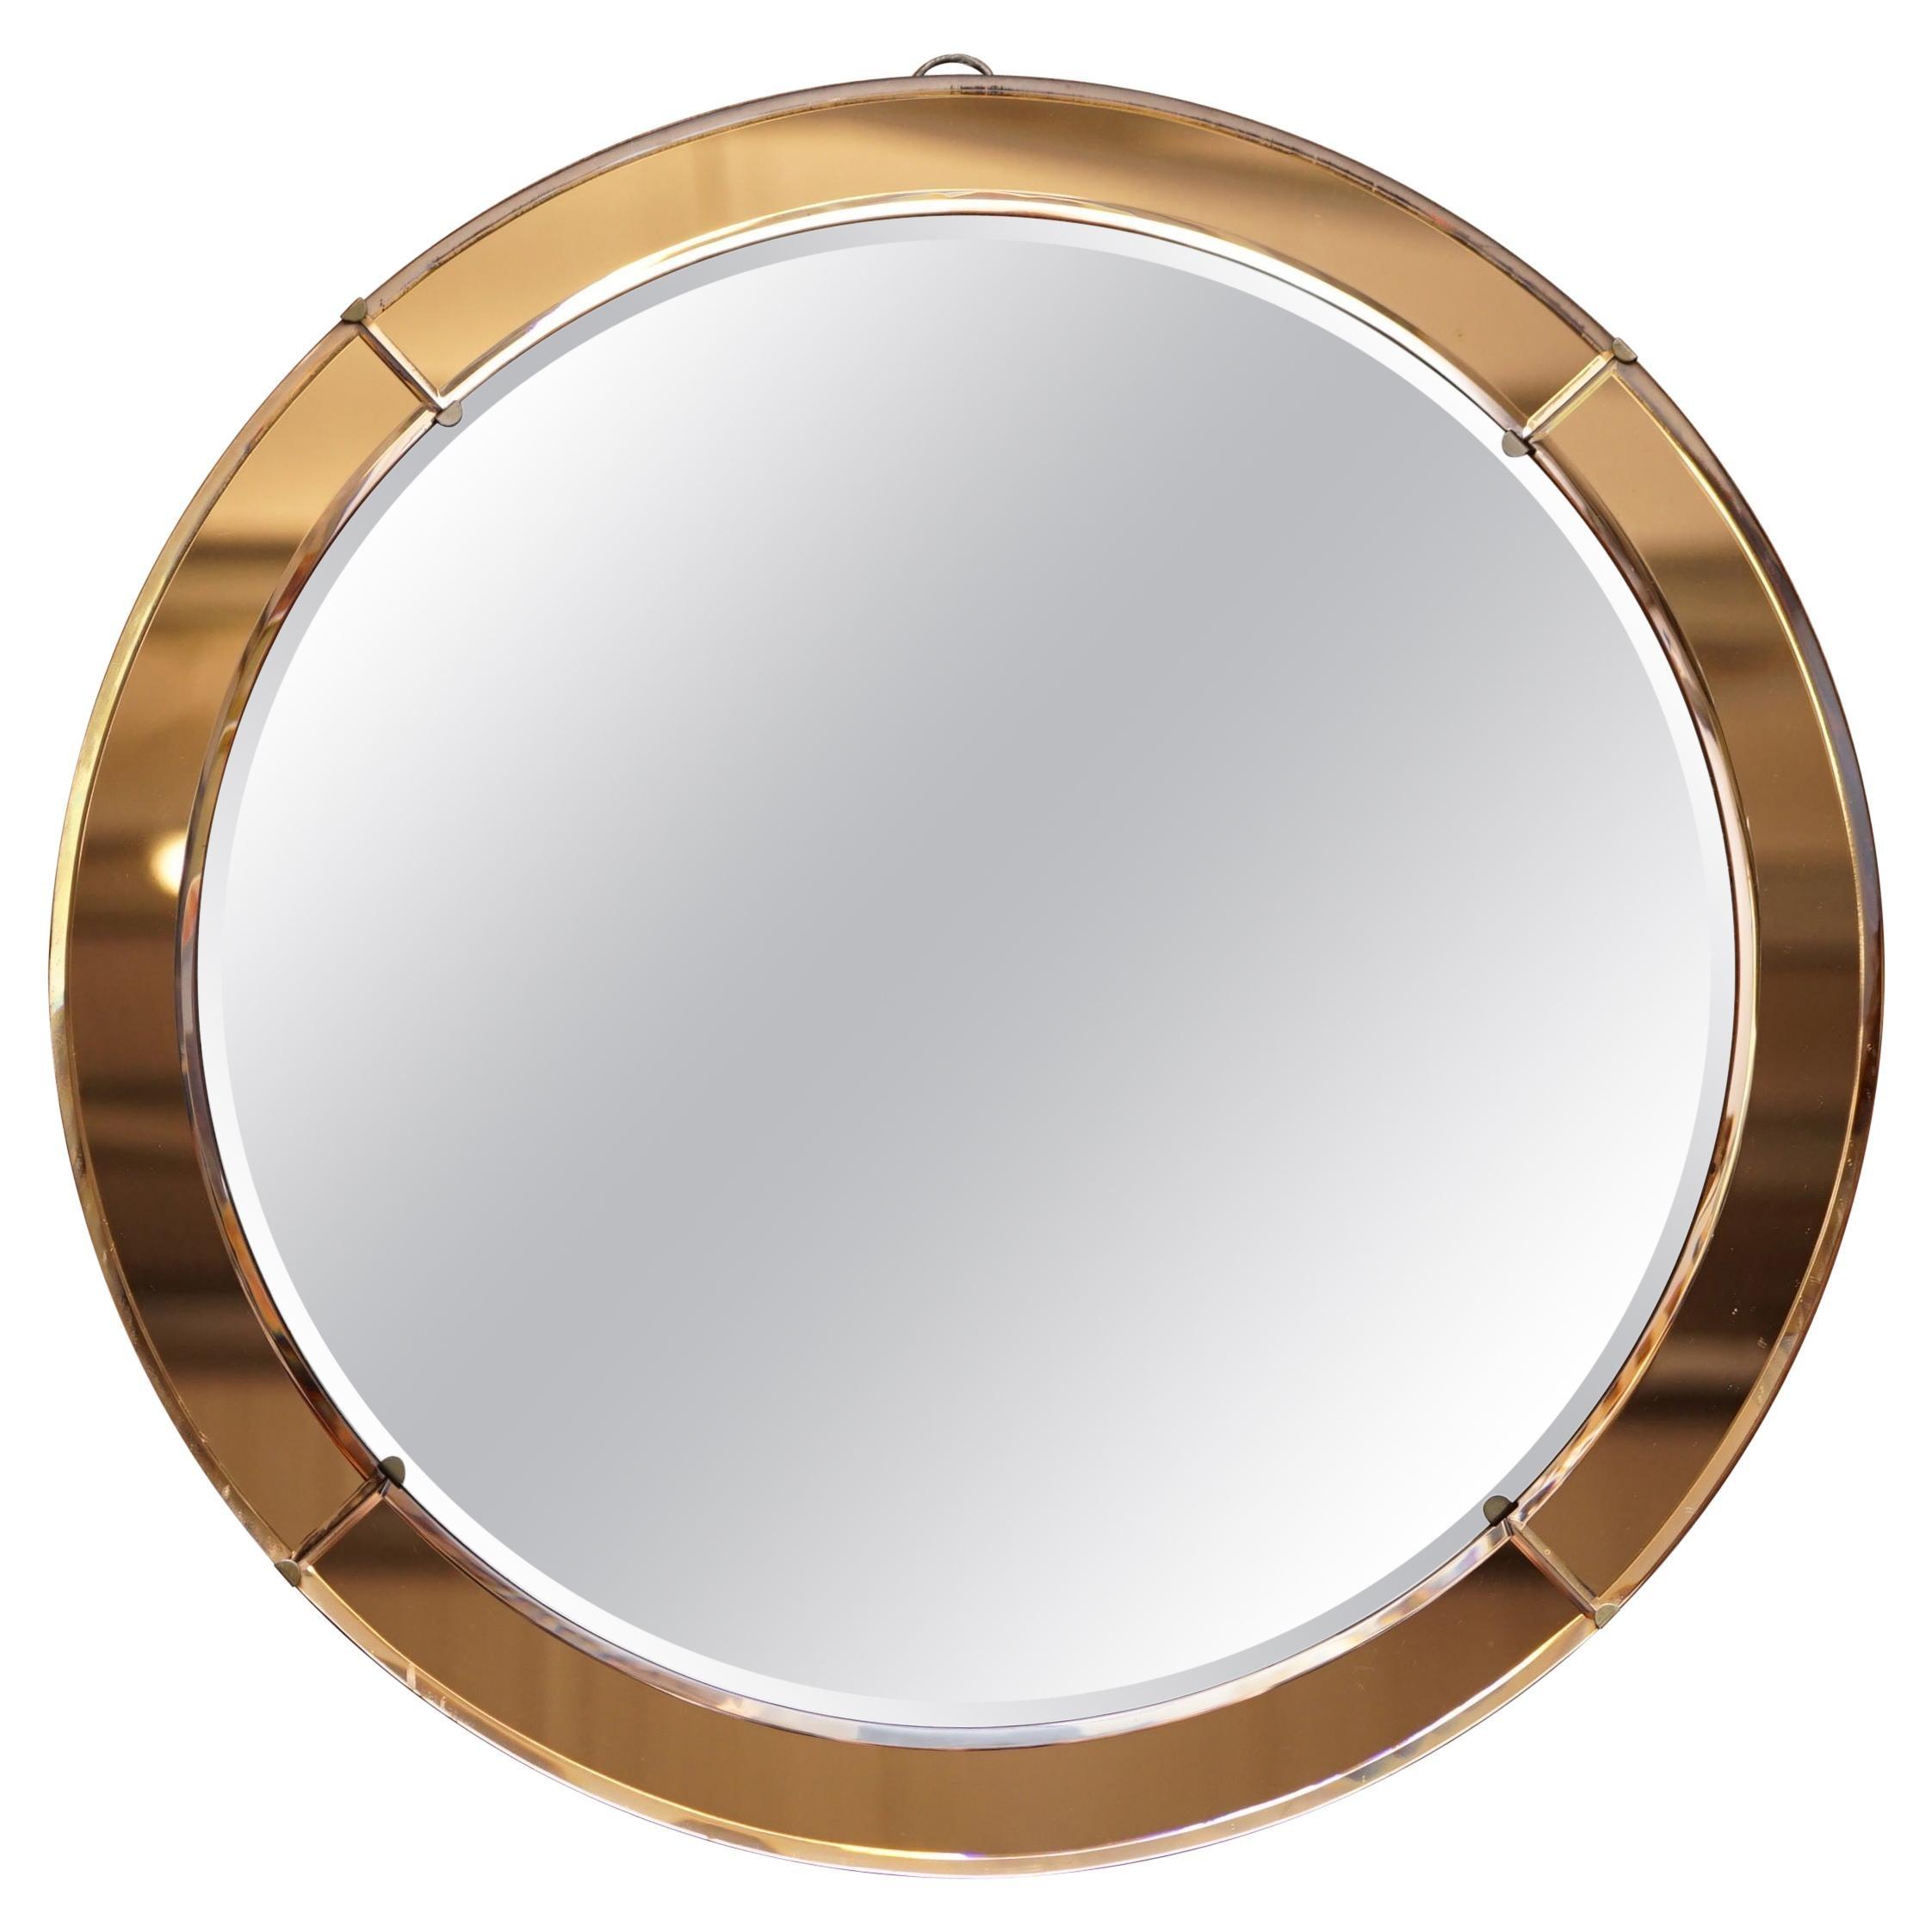 Art Deco Amber / Peach Glass Round Bevelled Wall Mirror Stunning Glass Patina